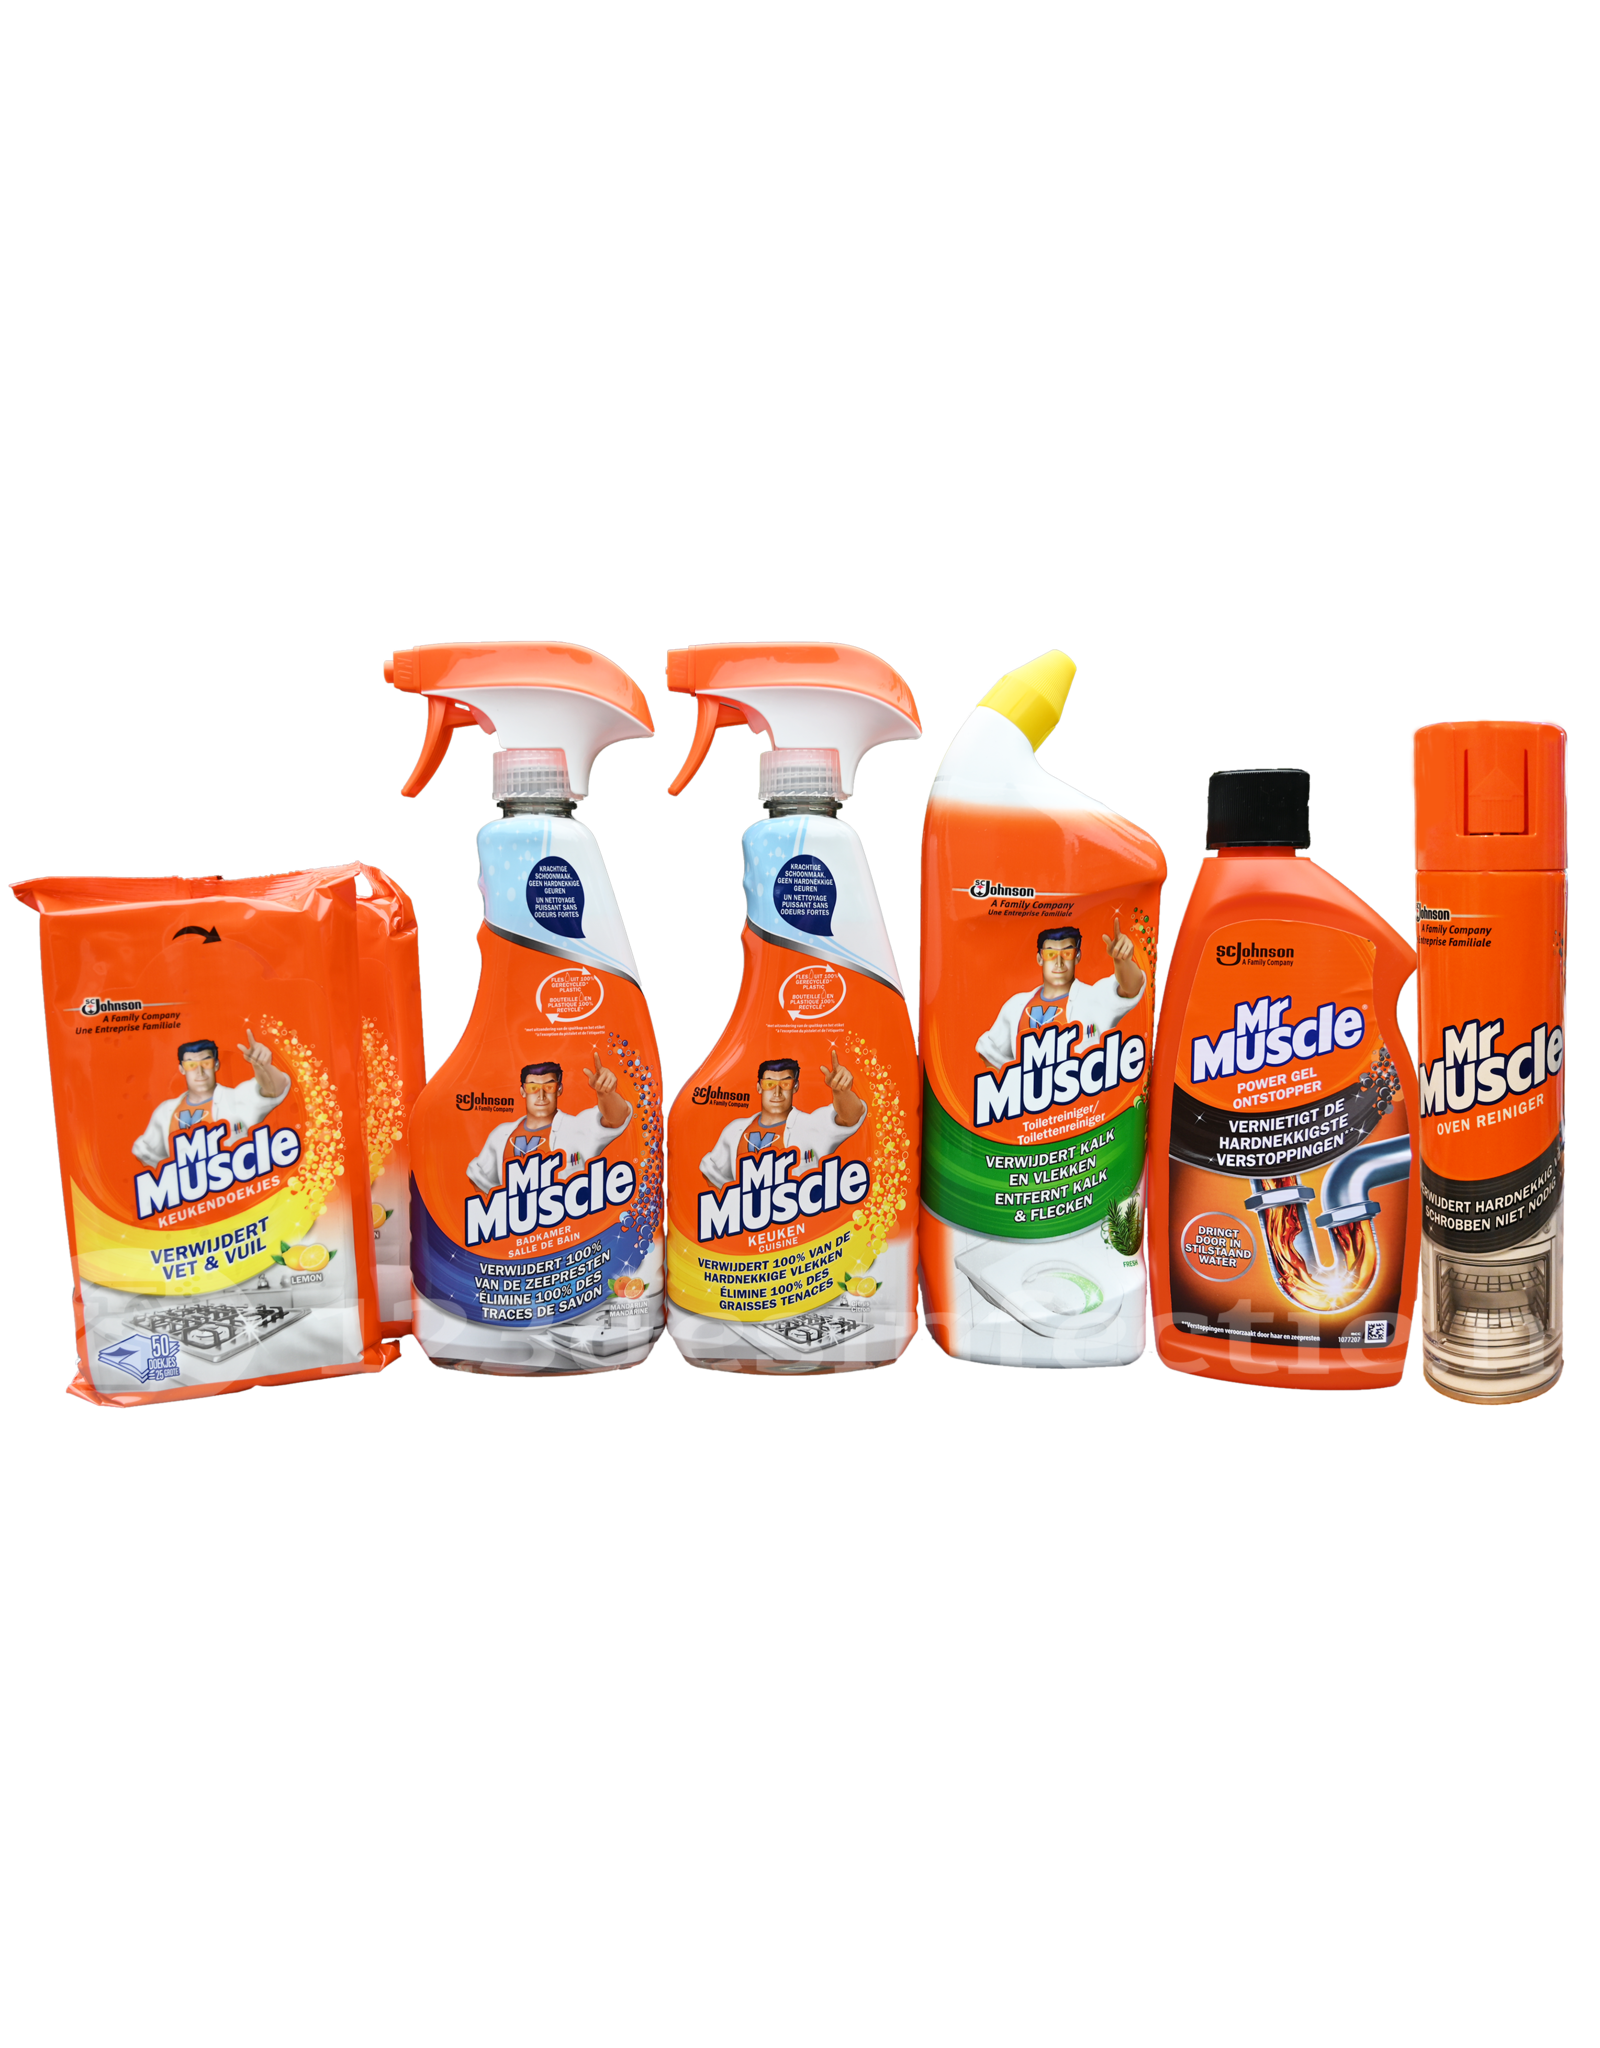 Mr Muscle Schoonmaak Pakket 2x Keukendoekjes Badkamer Keuken Spray Toiletreiniger Ontstopper Ovenreiniger 123desinfectie Nl